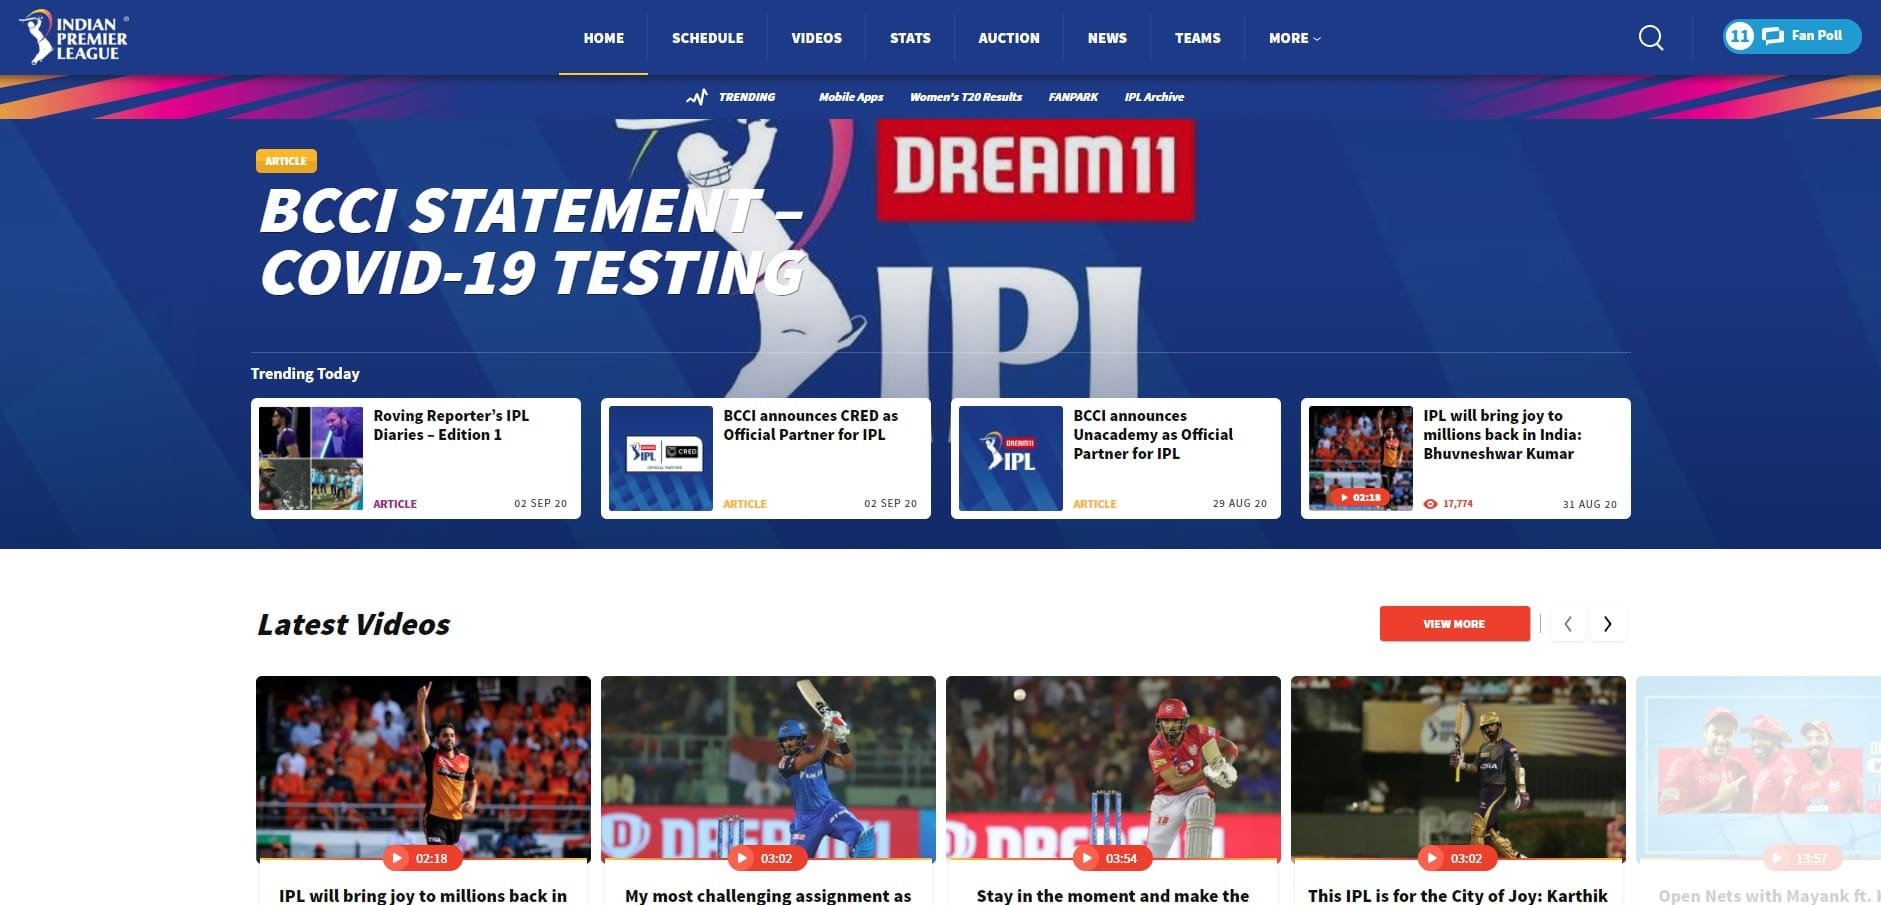 Ipl 2020 Live Streaming Websites Watch Online